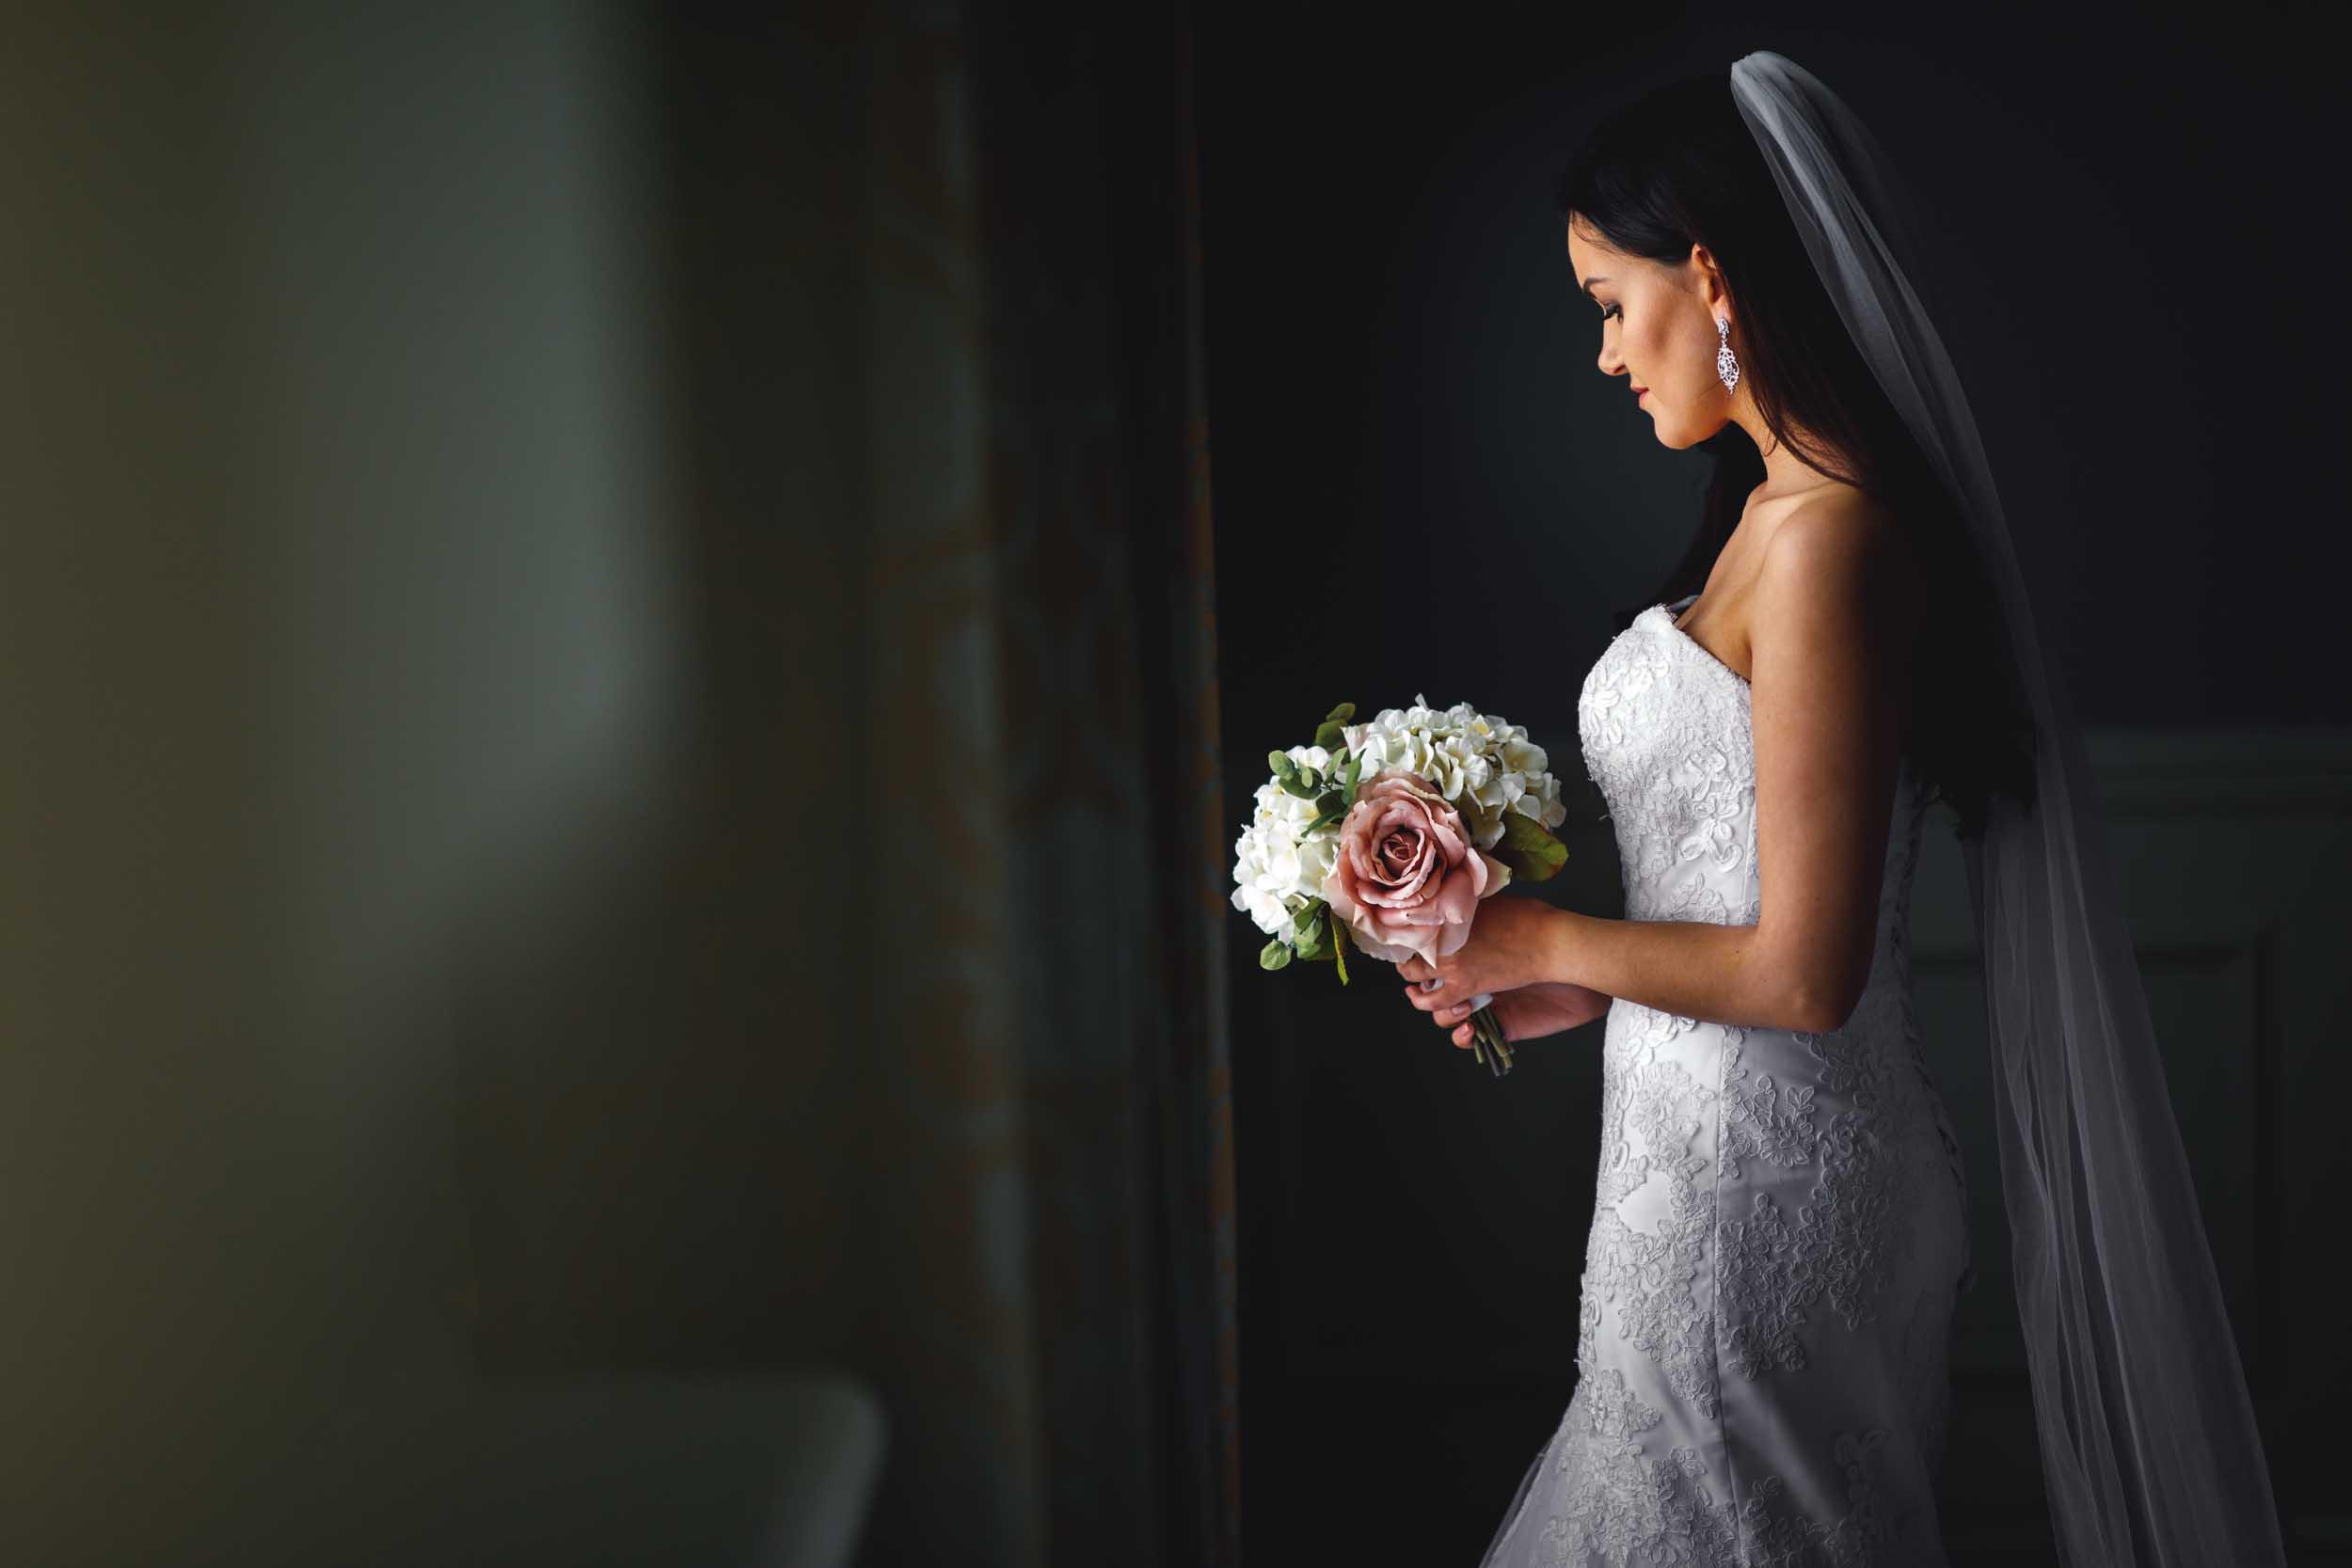 Cheltenham Wedding photographer, Wedding photography in Cheltenham, West Midlands wedding photographer, Queens Hotel Wedding Photography